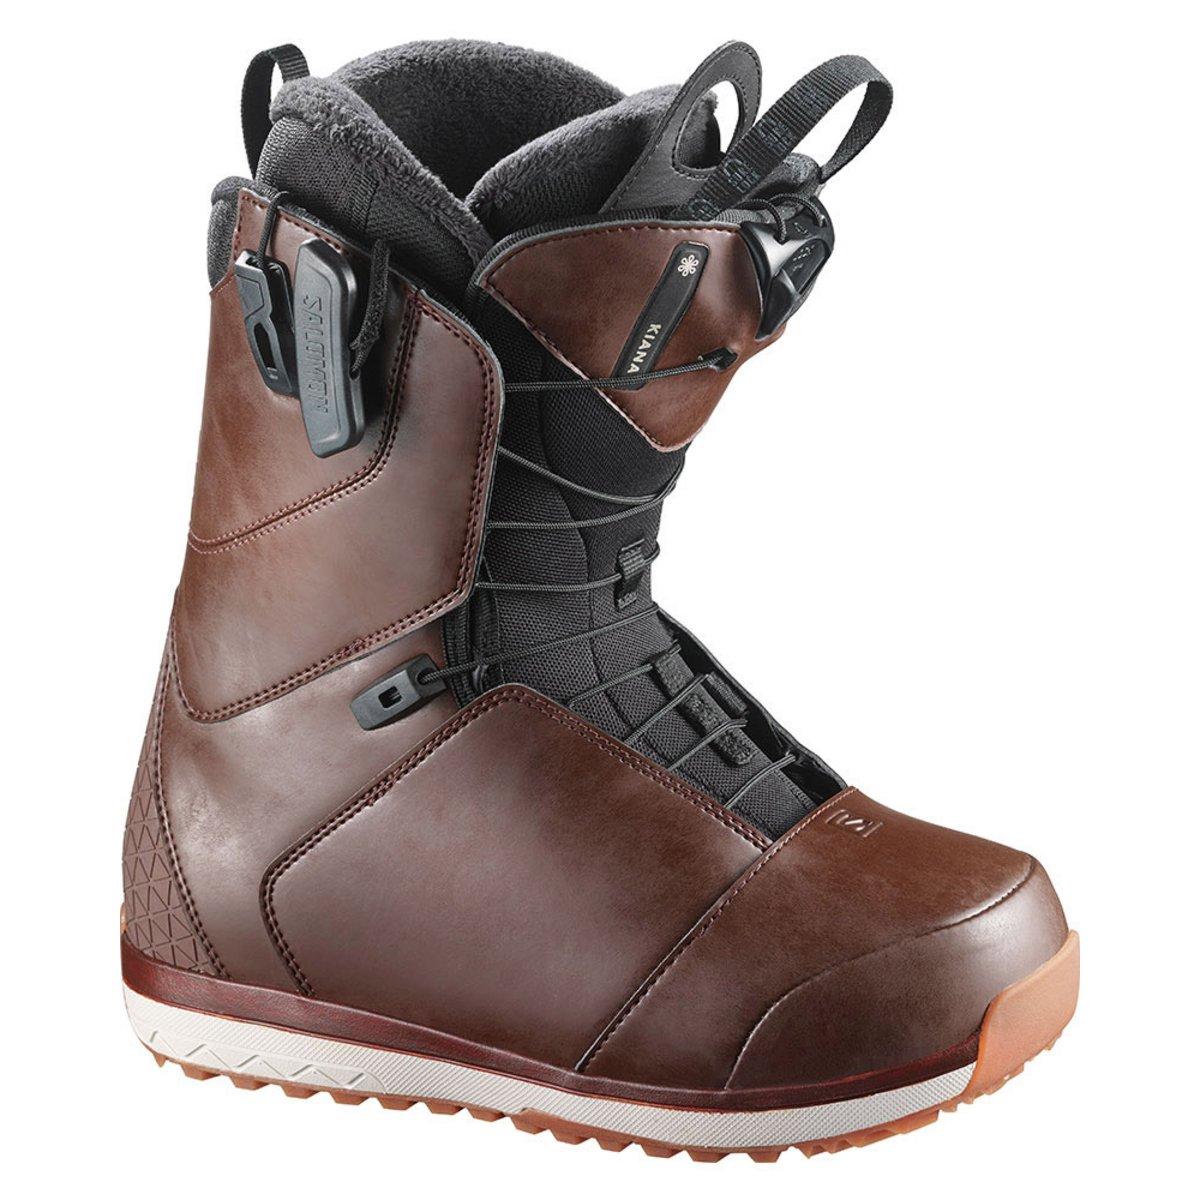 Salomon Women's Kiana Snowboard Boots 2017 / 2018 0